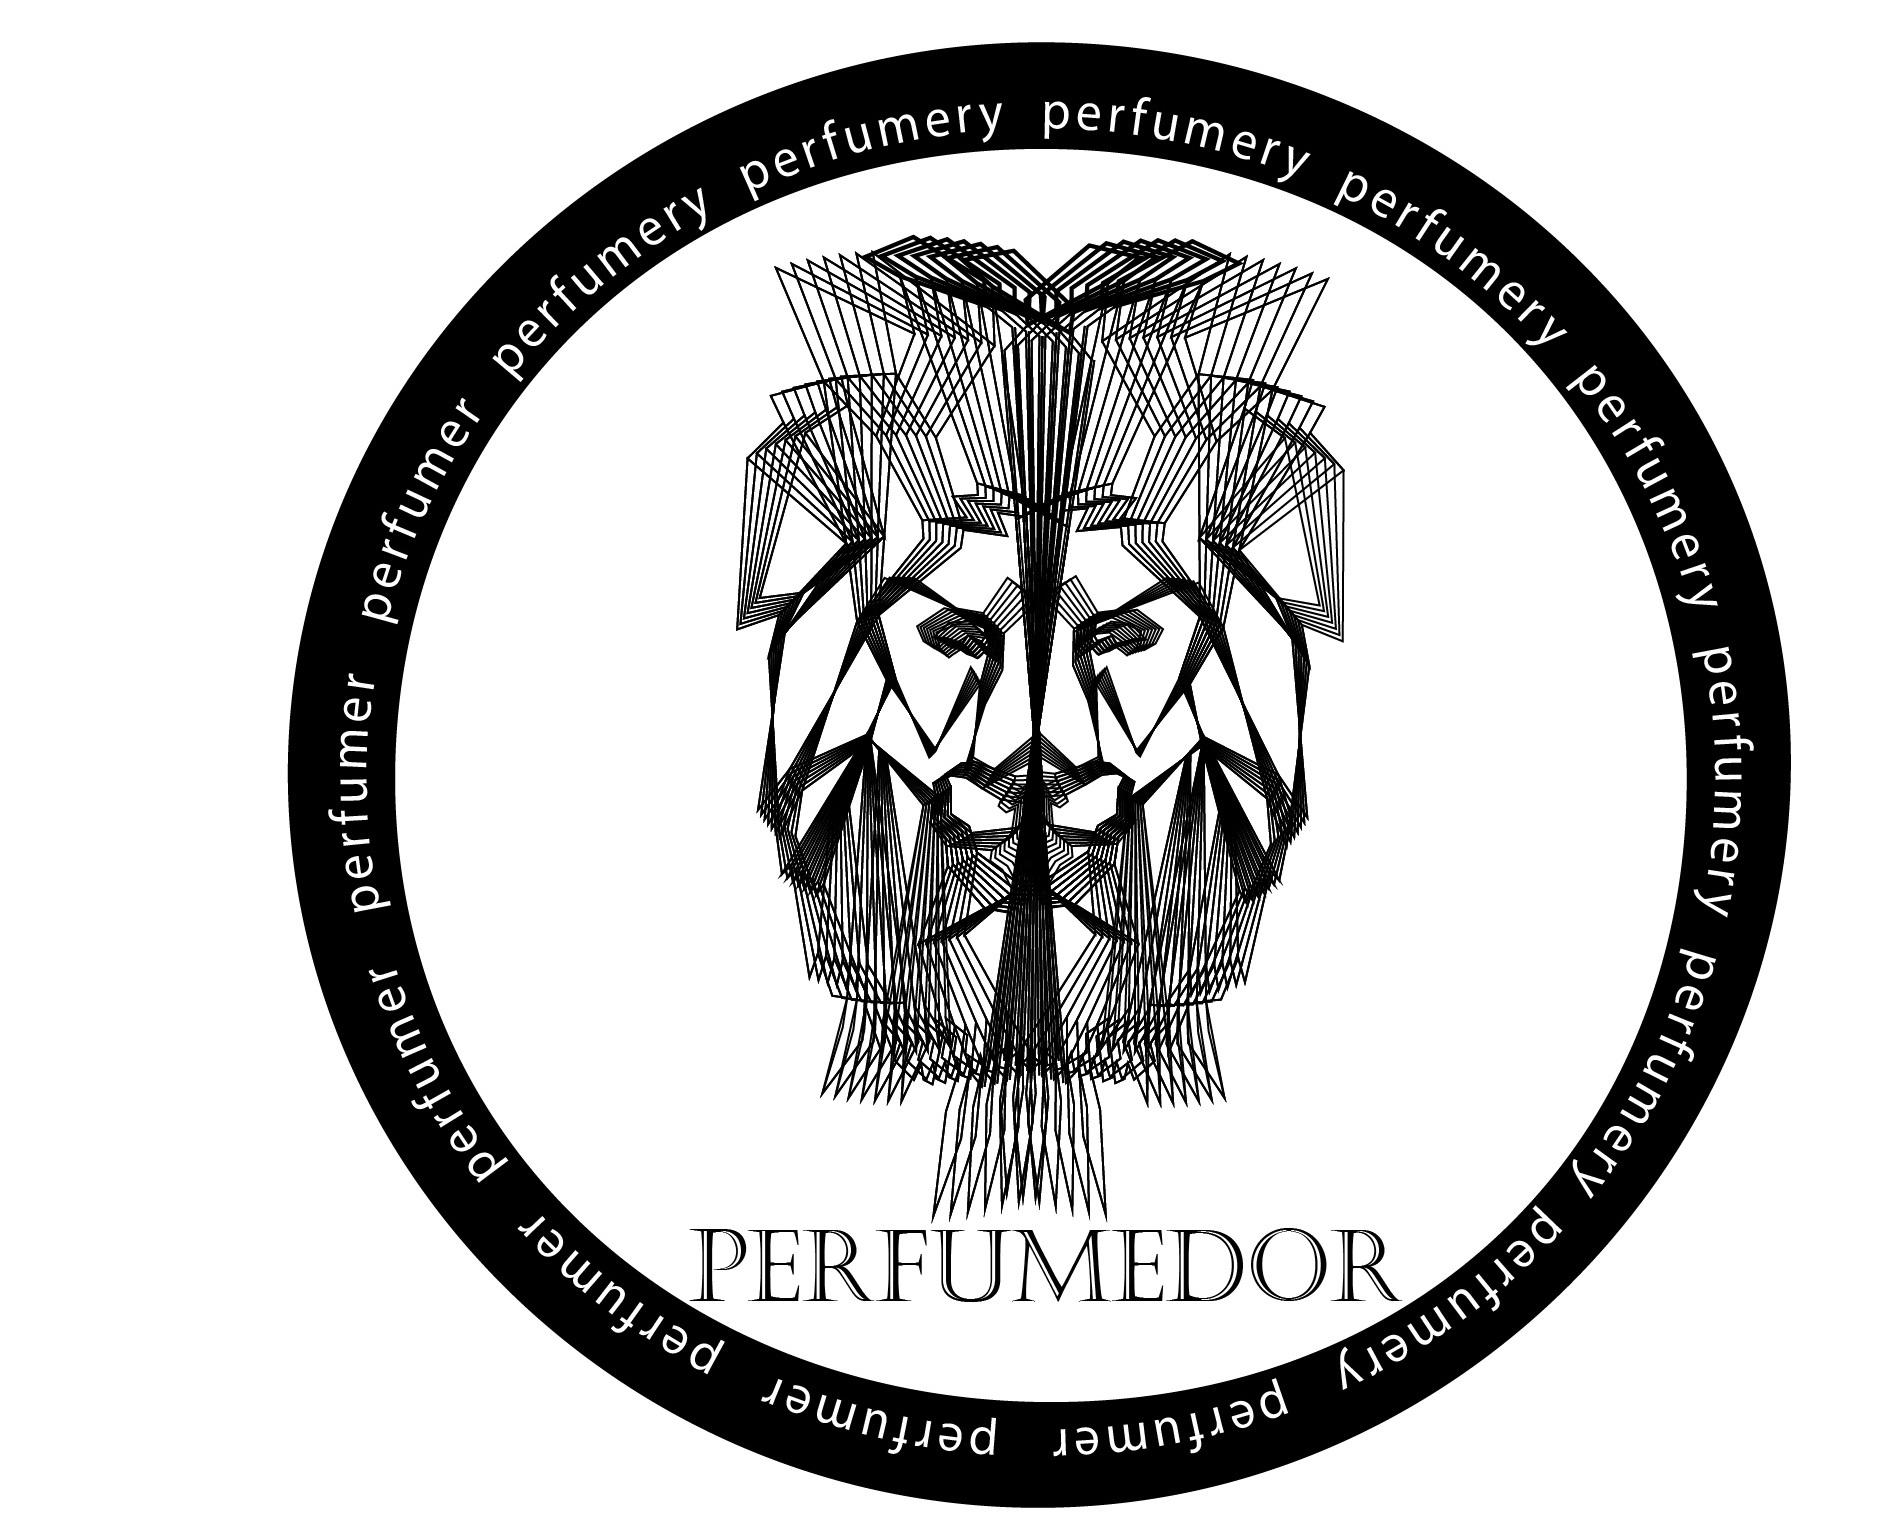 Логотип для интернет-магазина парфюмерии фото f_6595b46038edf545.jpg